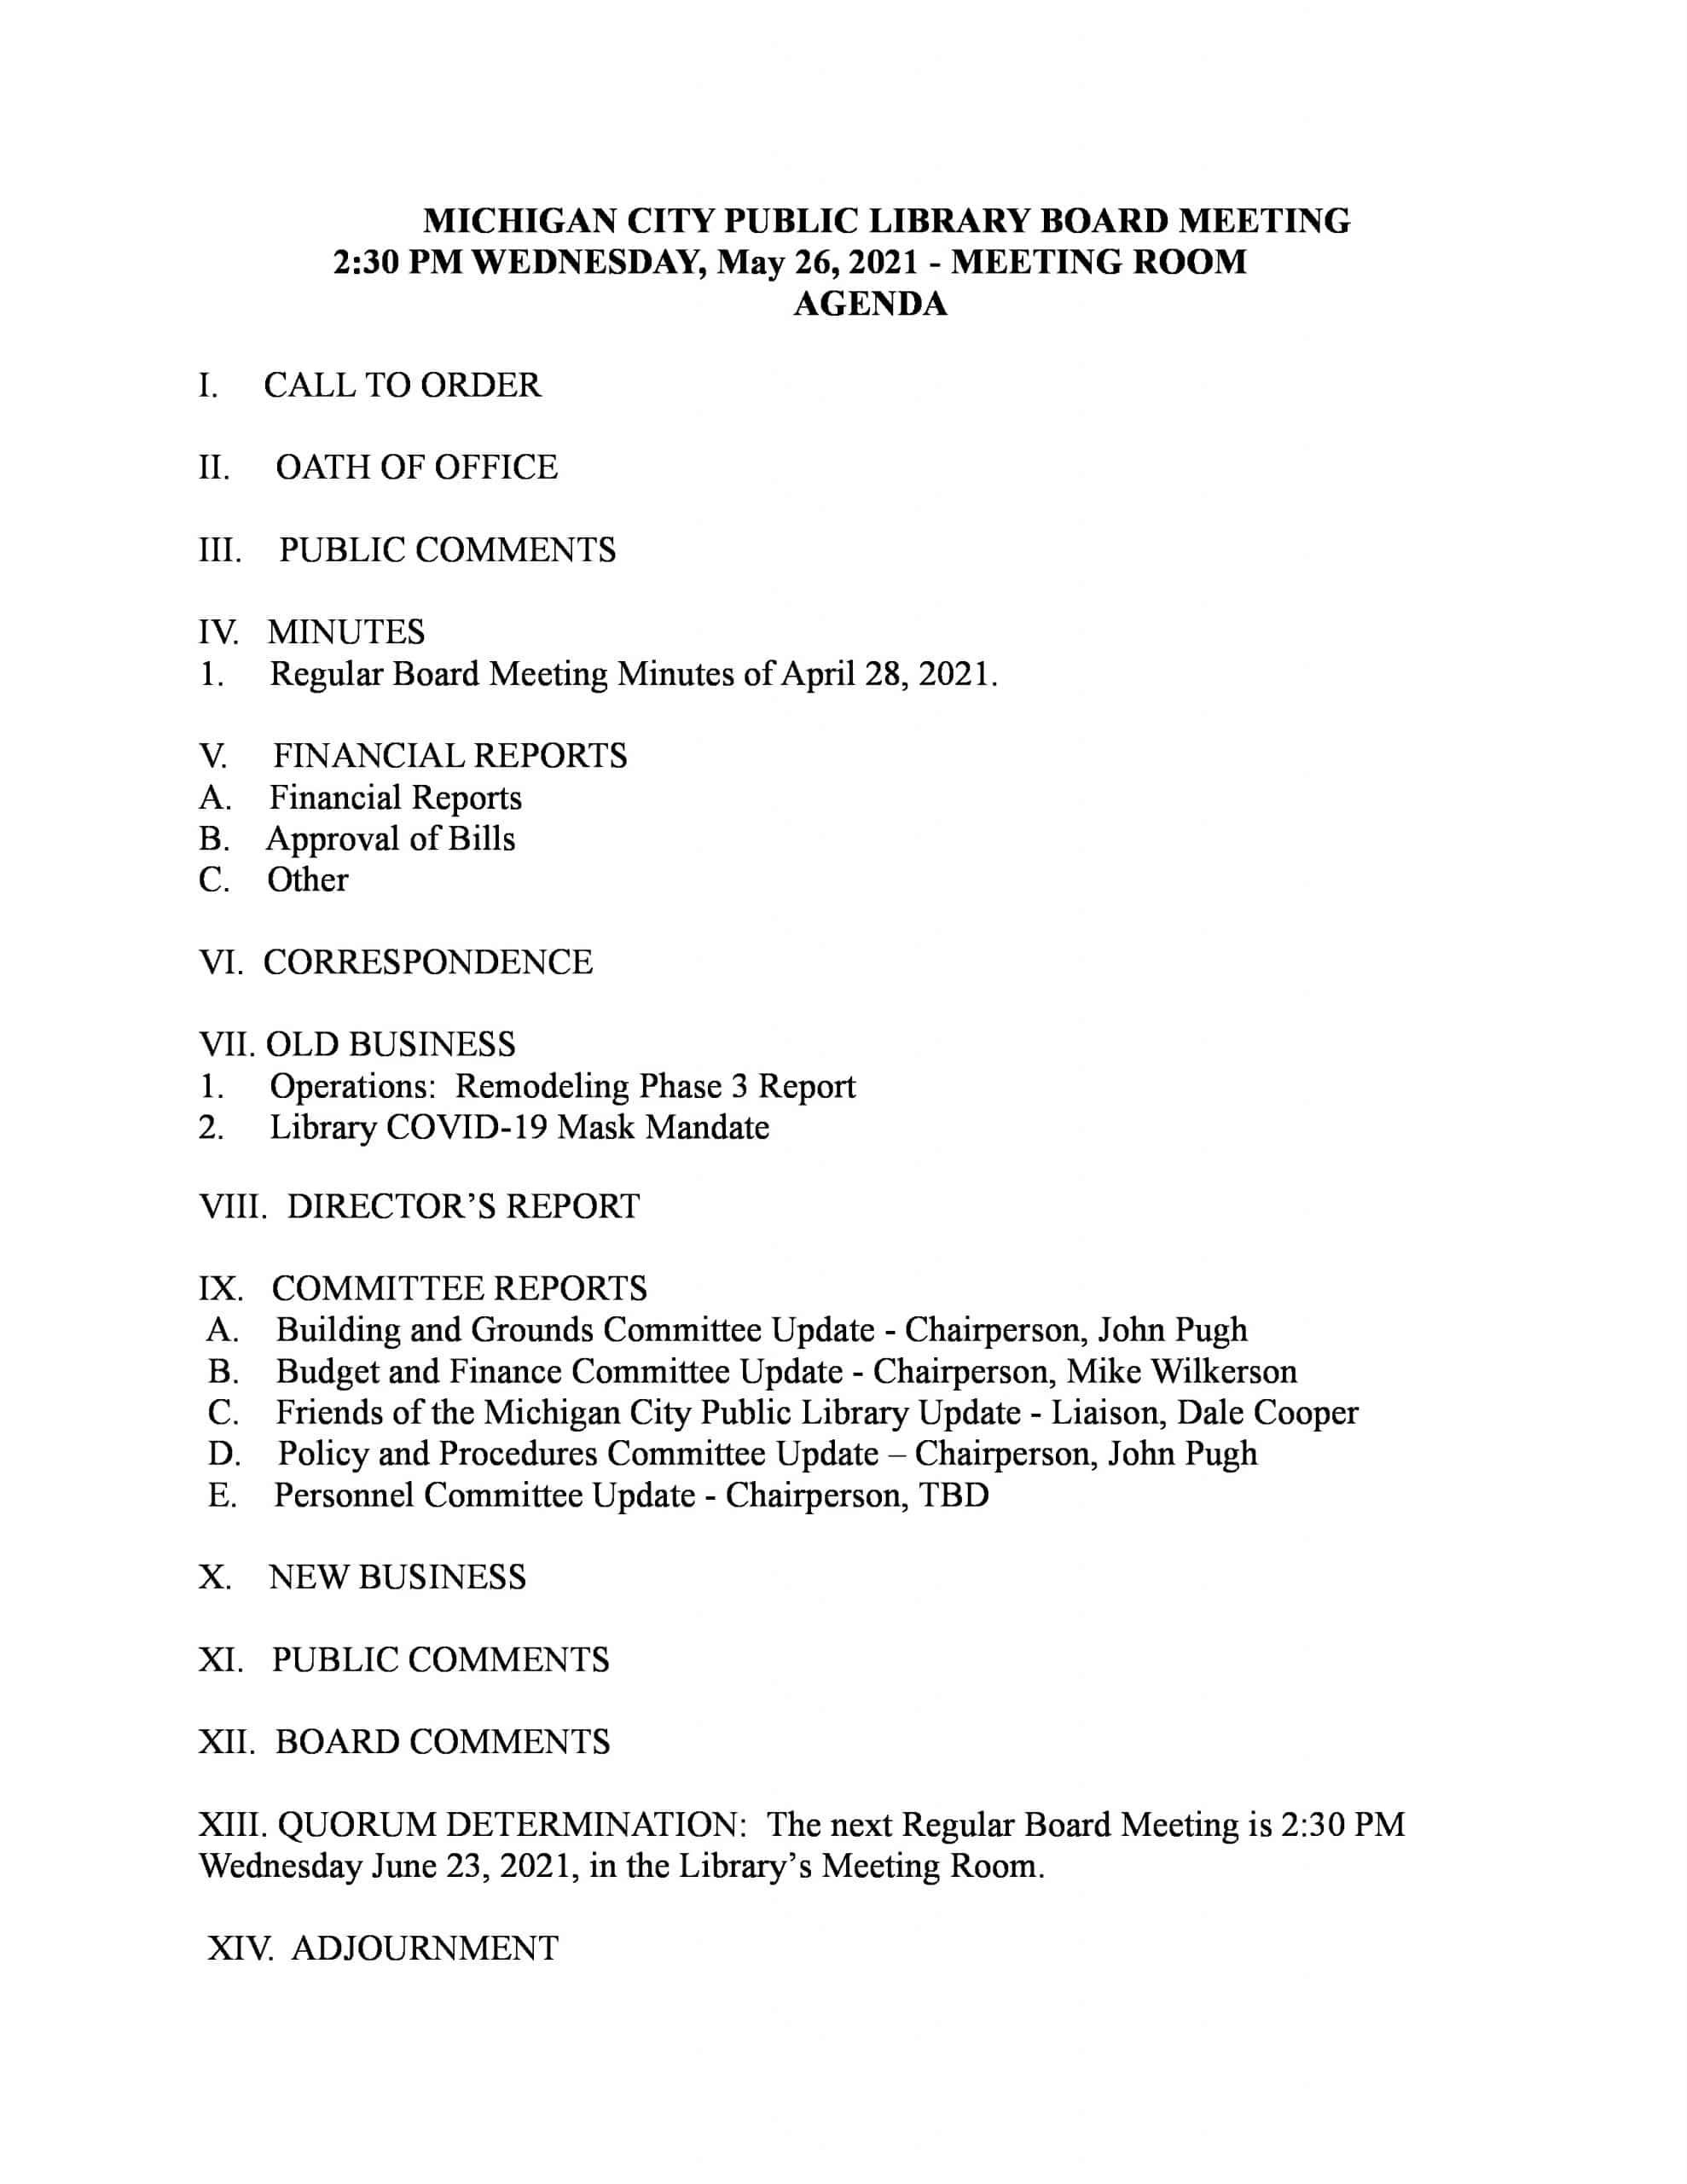 Board of Trustees May 2021 agenda